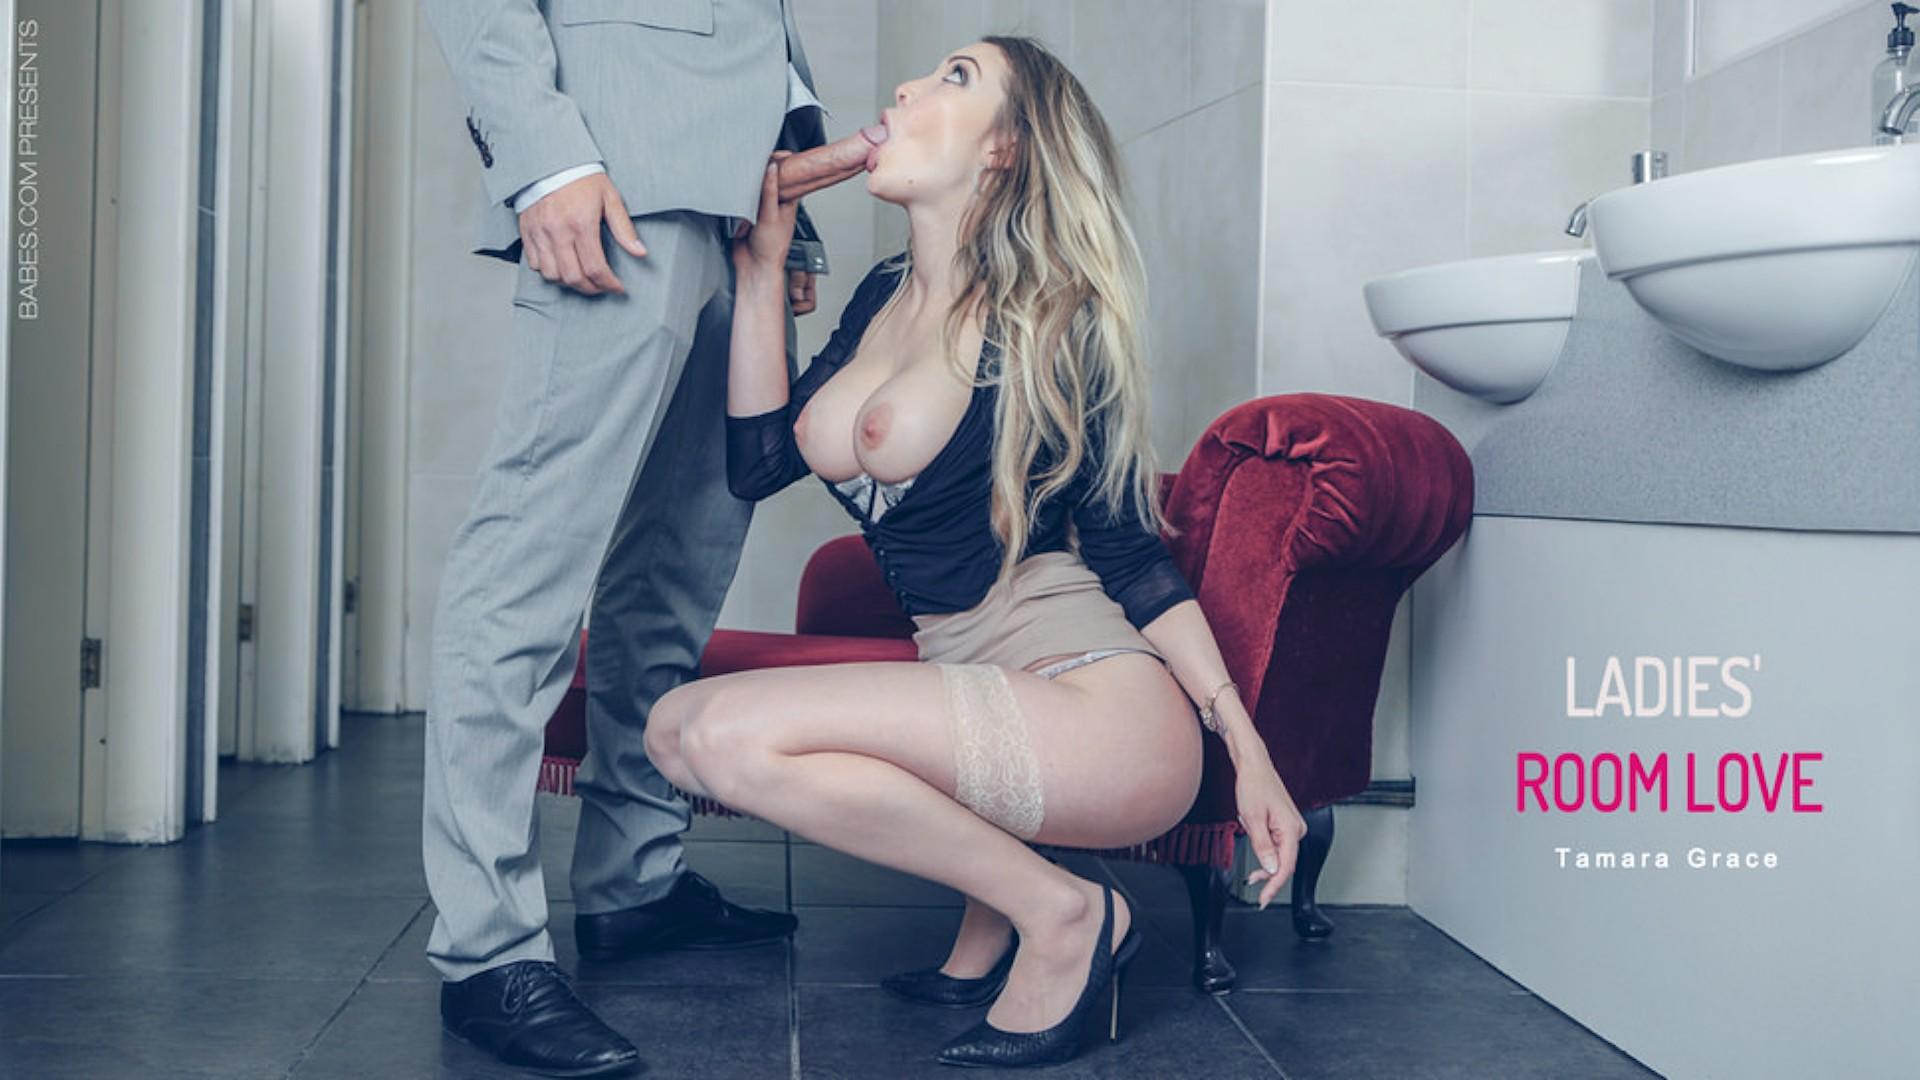 Ladies' Room Love - Office Obsession